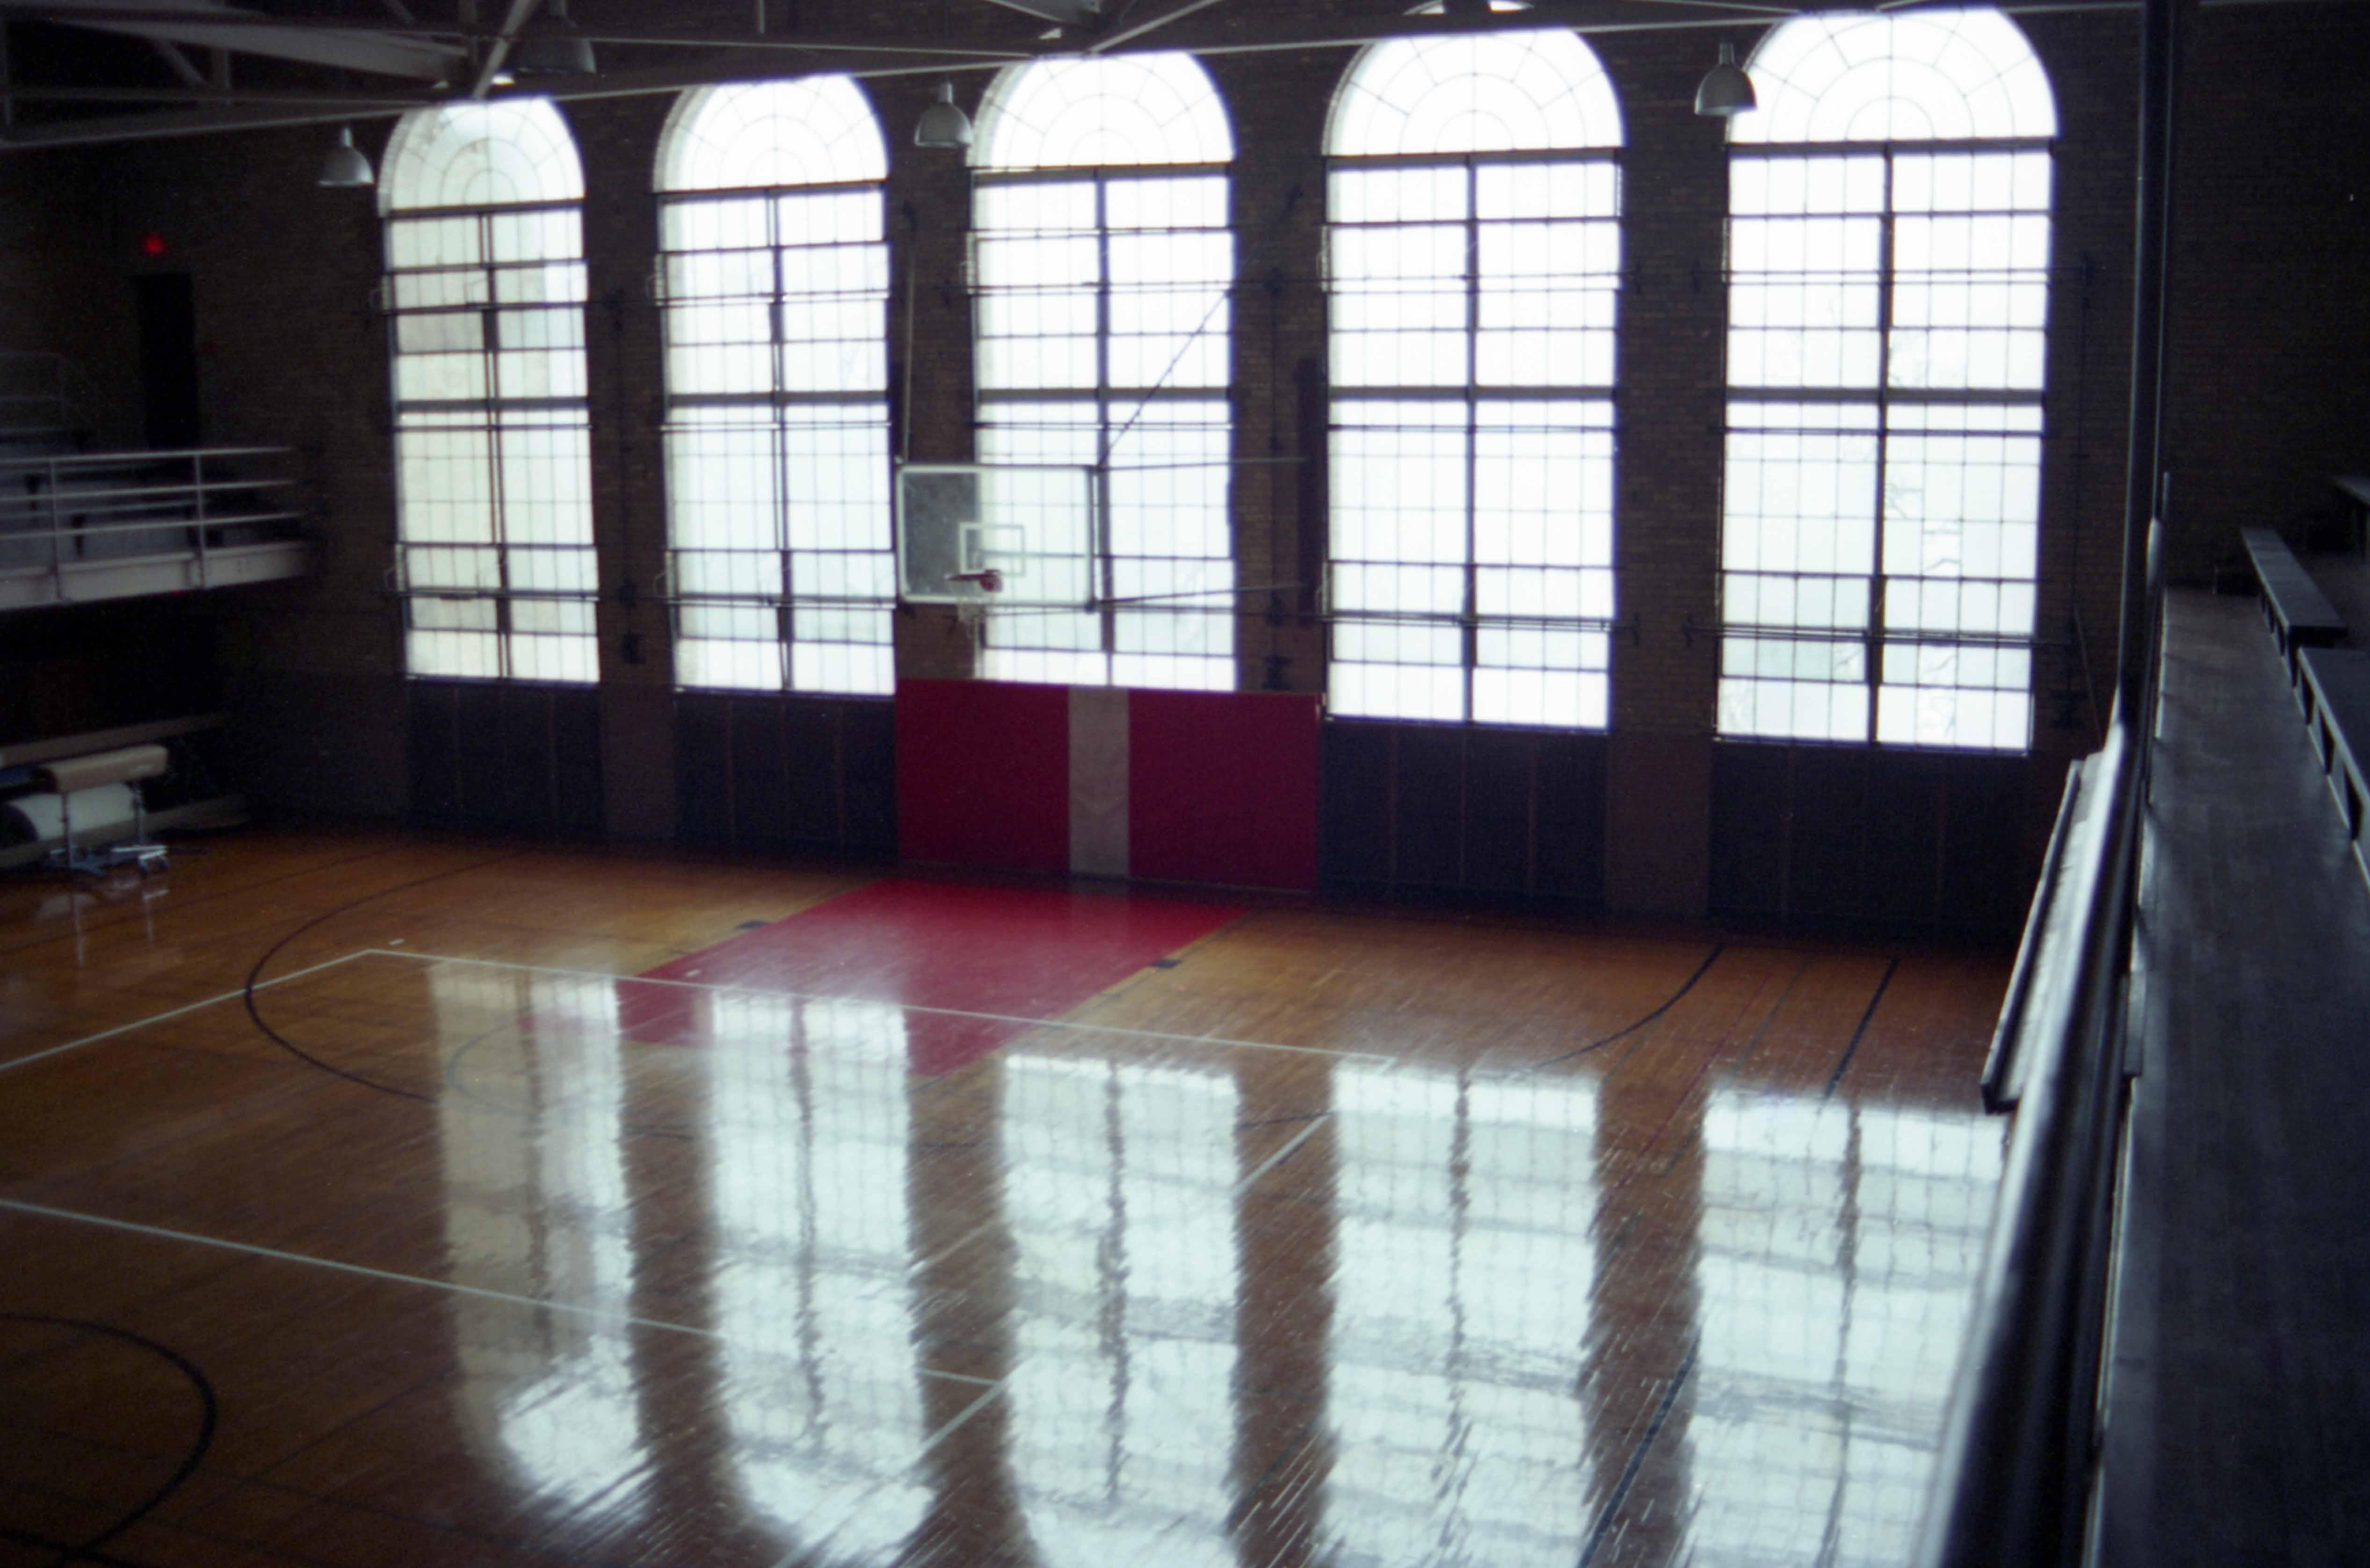 Eastman Hall gymnasium and east windows, January 1995